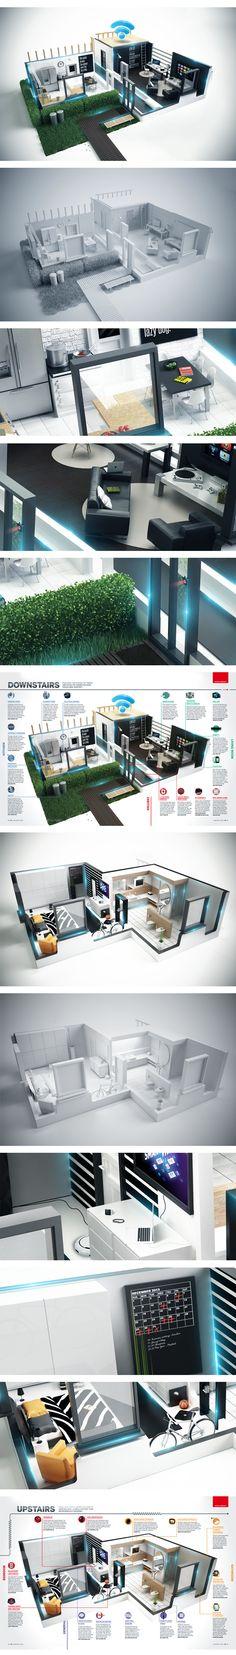 T3- The Connected Home by Peter Tarka, via Behance  #Cinema4D, #C4D, #Cinema4D, #C4D,#3D,#archictecural rendering,